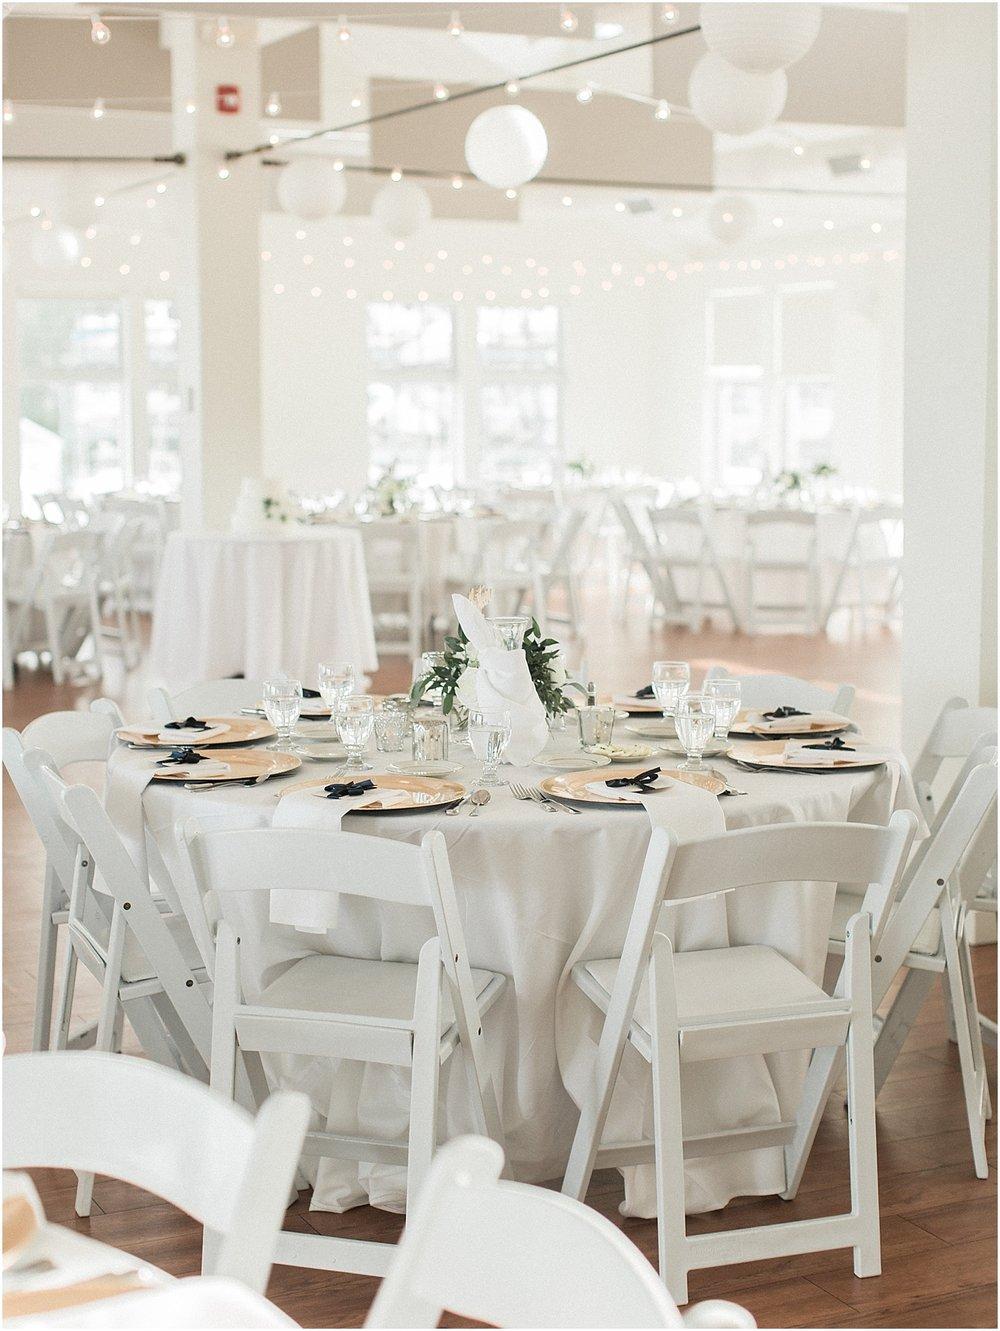 claire_gordon_duxbury_bay_maritime_school_beach_dock_powder_point_bridge_cape_cod_boston_wedding_photographer_meredith_jane_photography_photo_0603.jpg